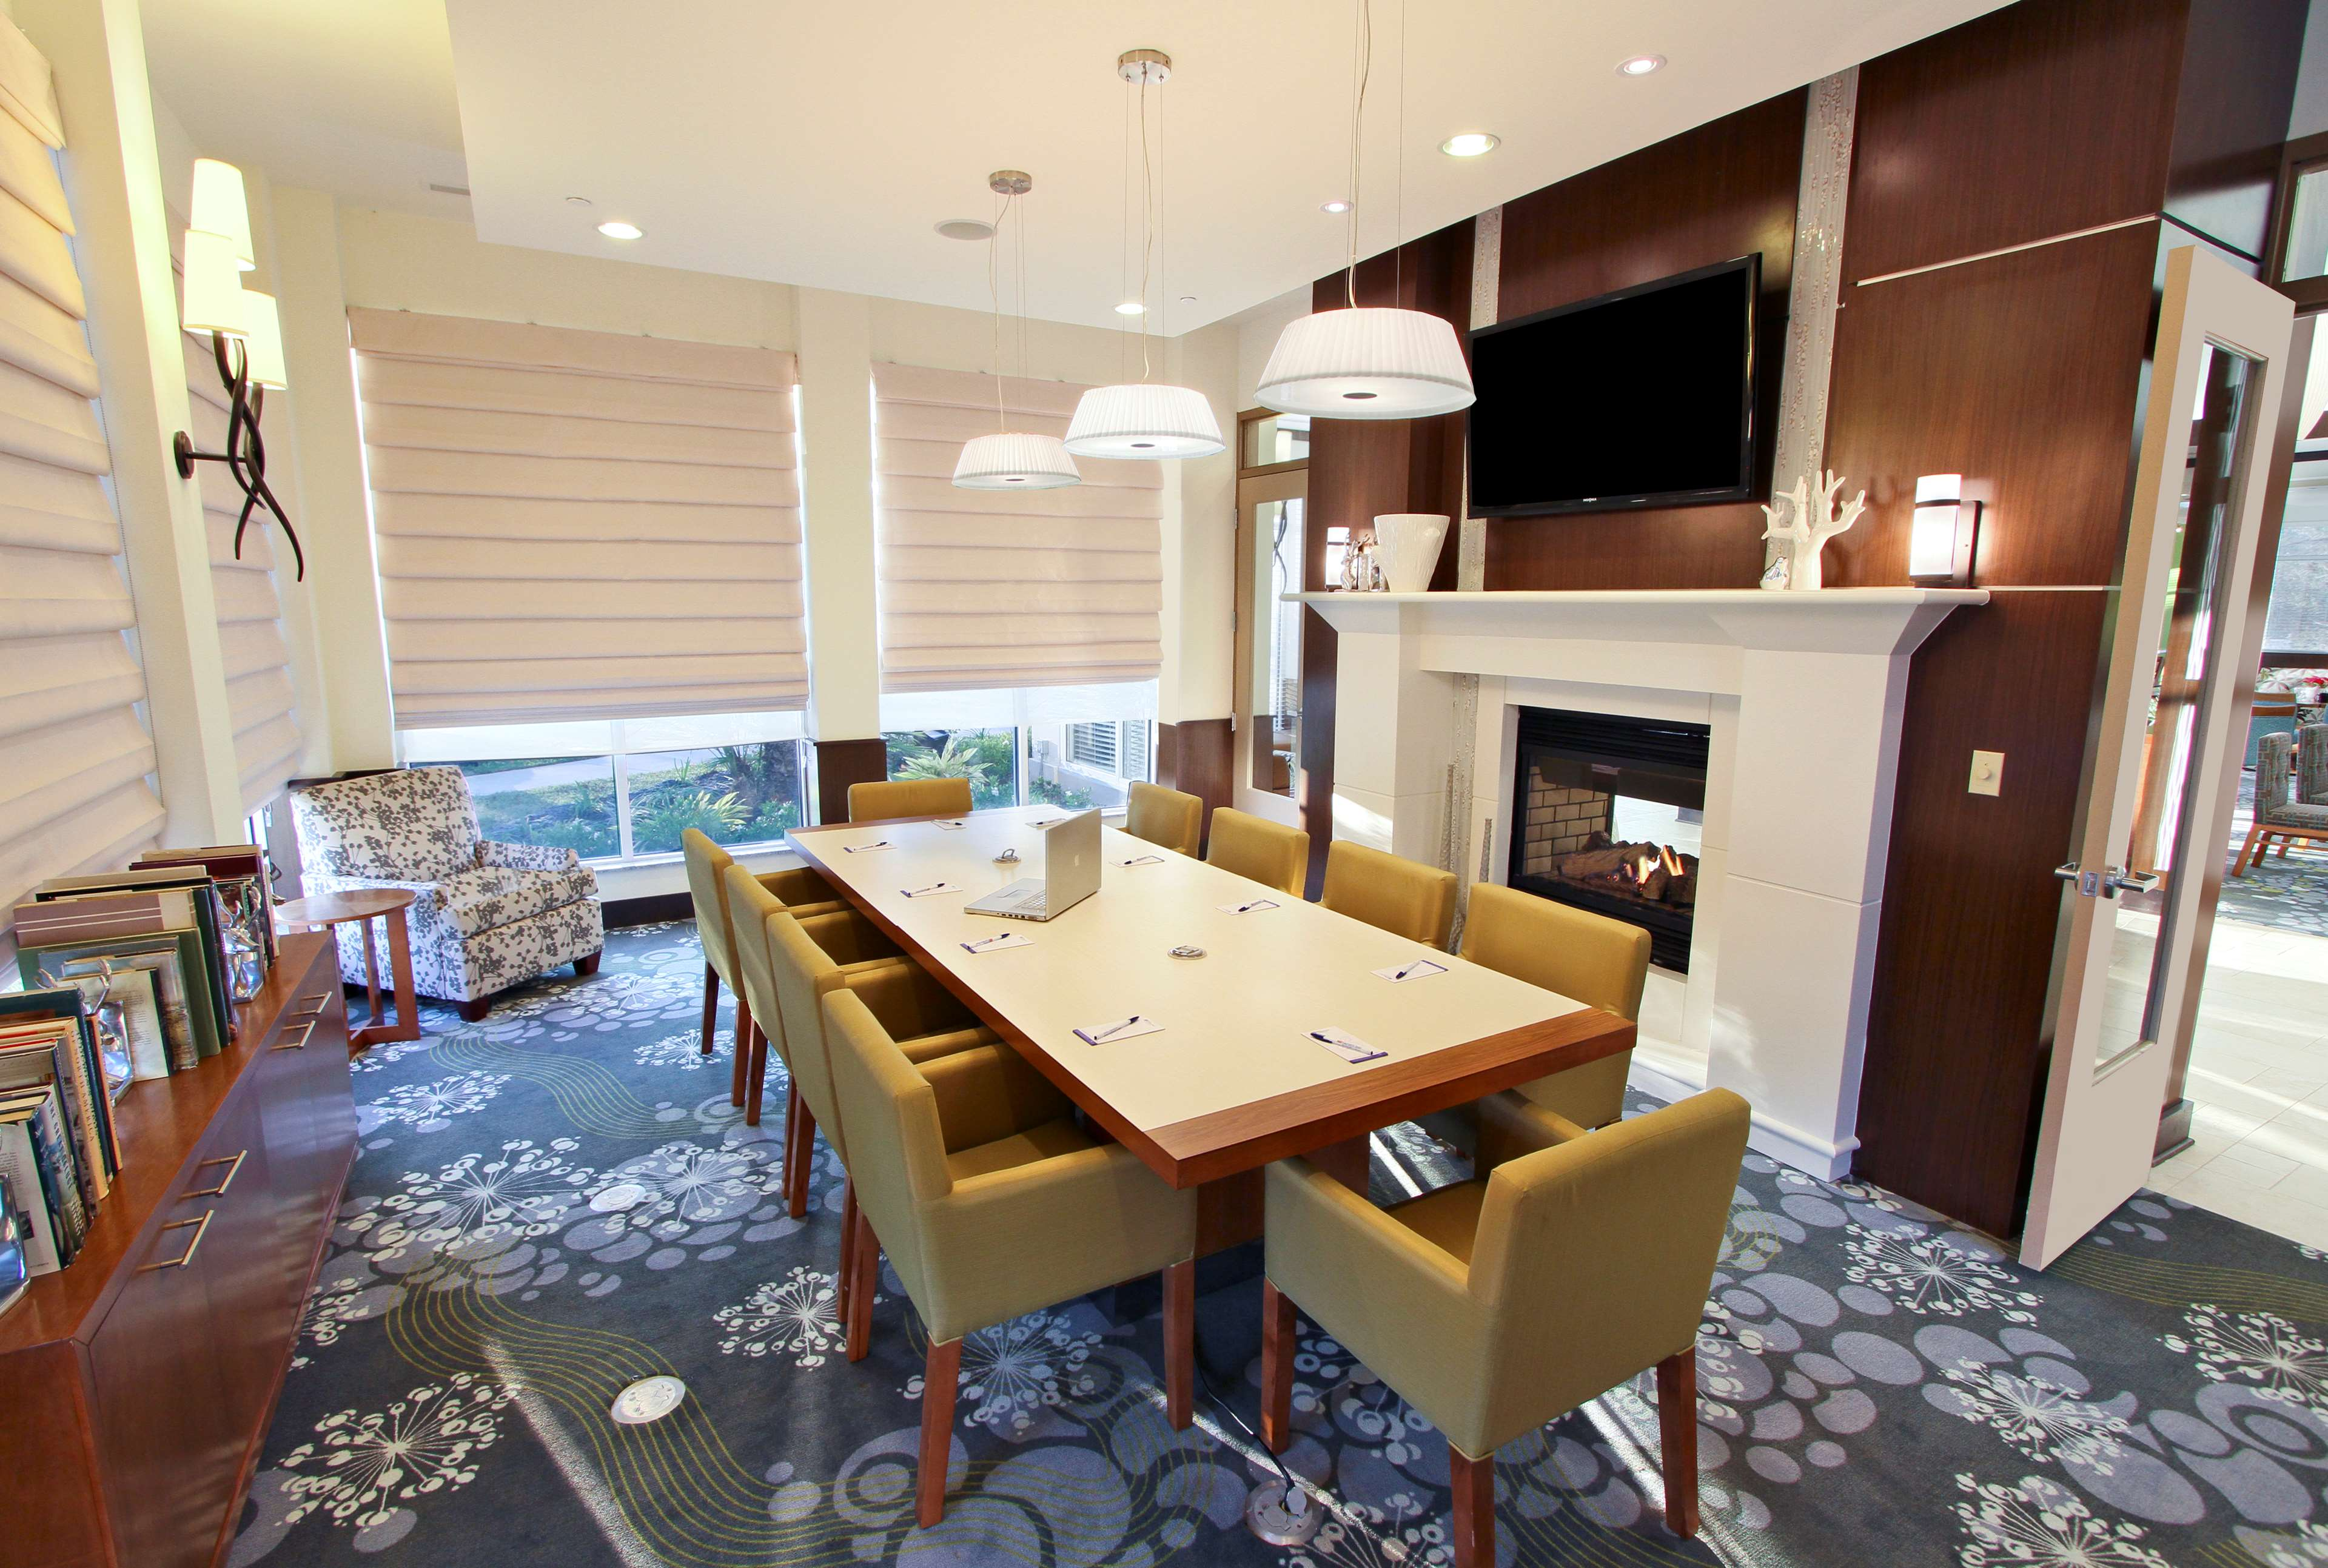 Hilton Garden Inn Covington/Mandeville image 21